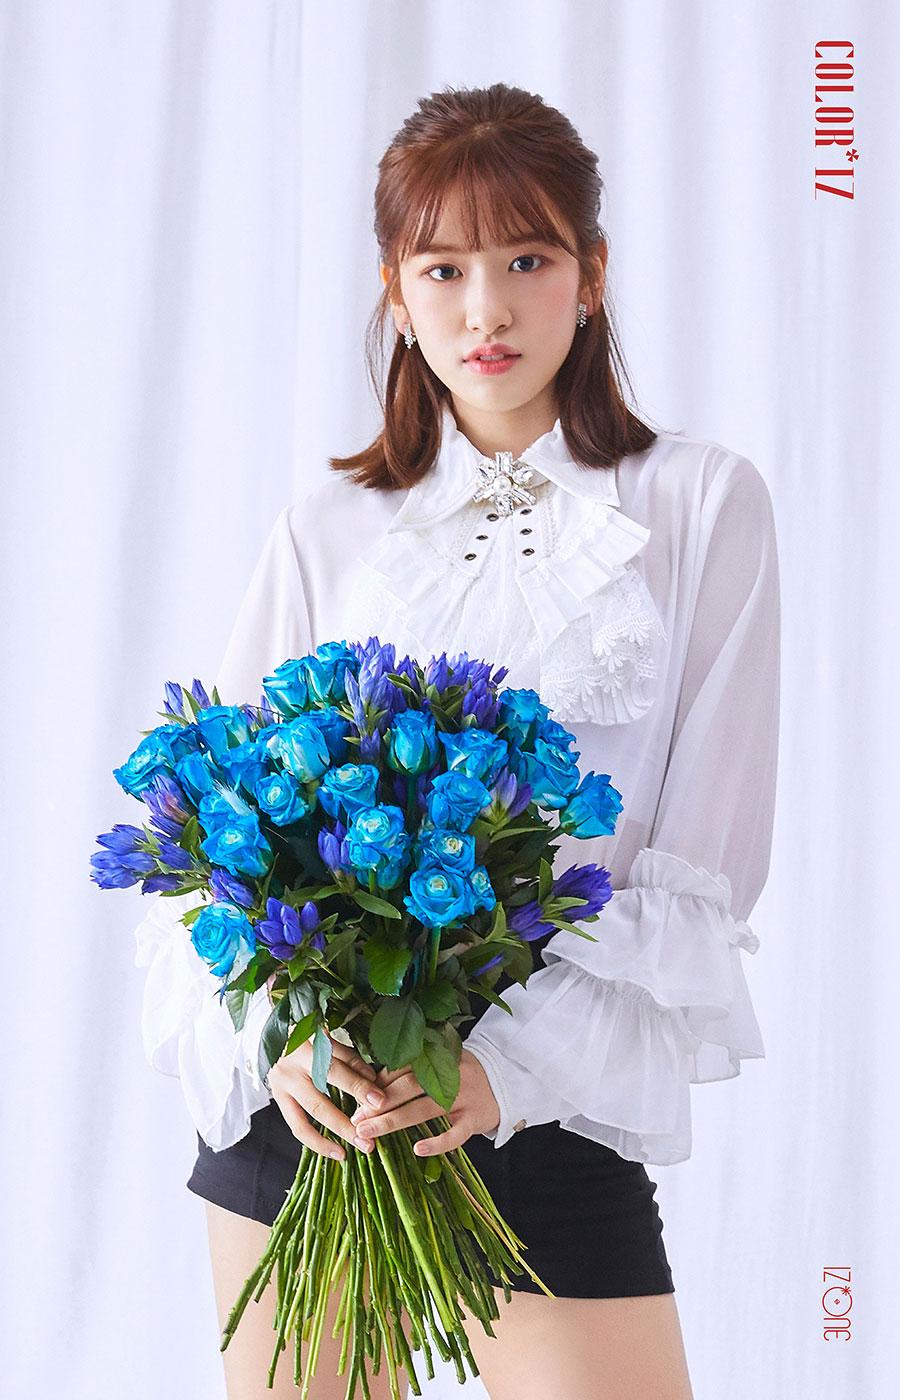 izone, izone profile, izone facts, izone members, izone age, izone leader, izone maknae, izone an yujin, ahn yujin, yujin